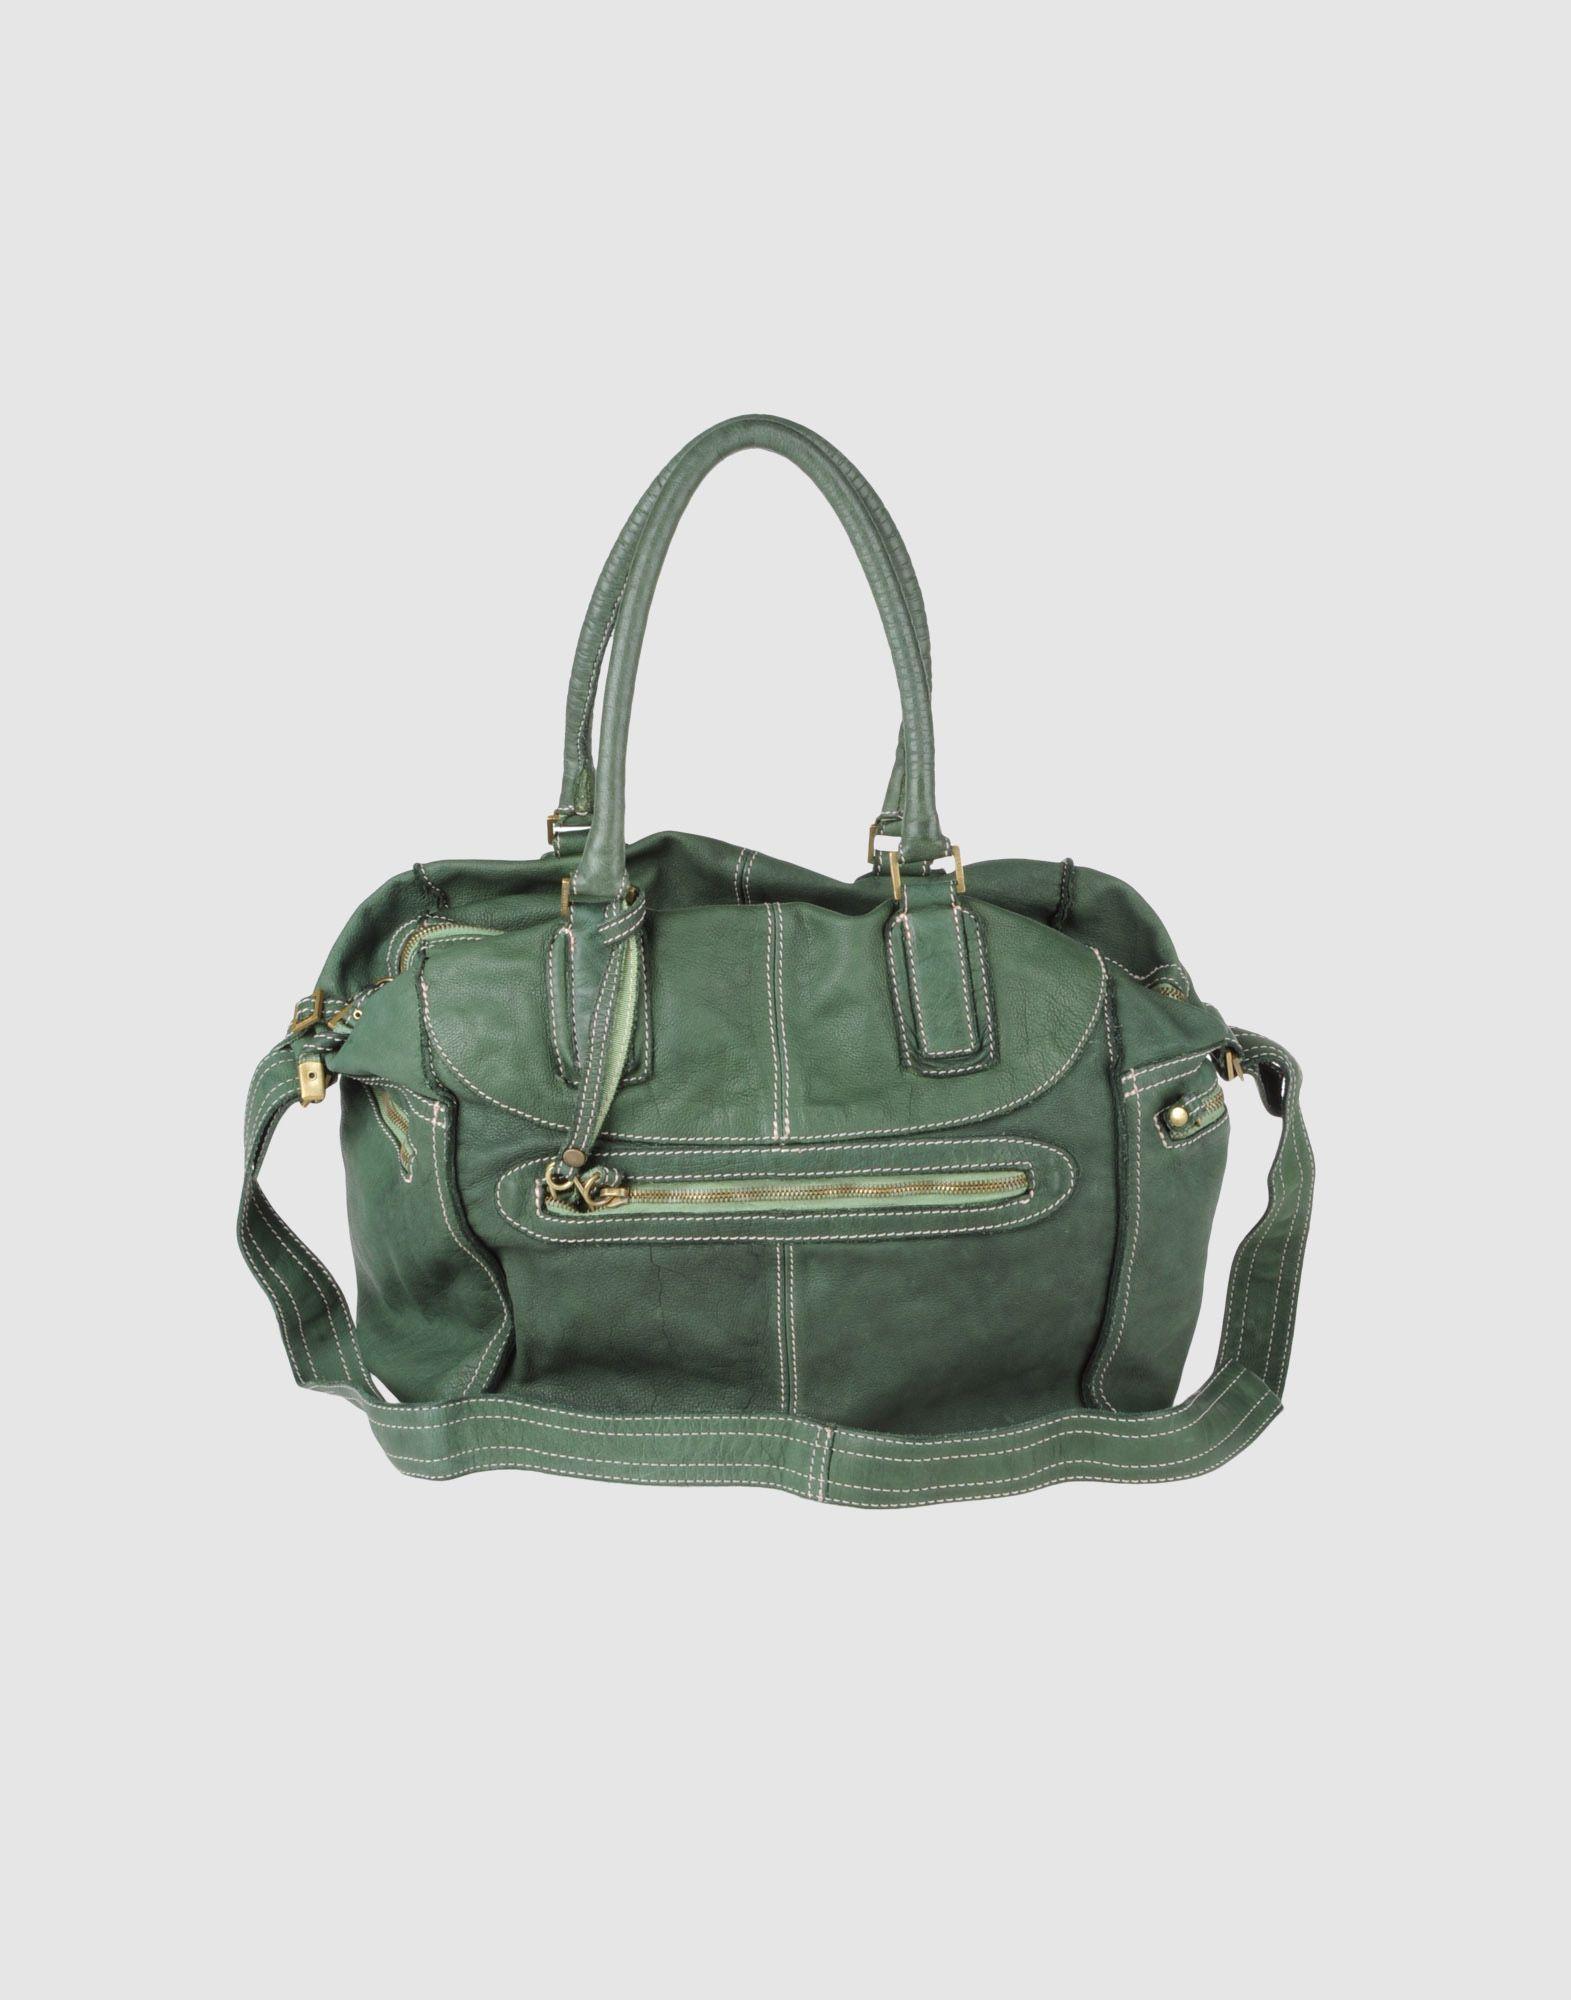 03096c4021645 SISSI ROSSI Women - Handbags - Large leather bag SISSI ROSSI on YOOX United  States